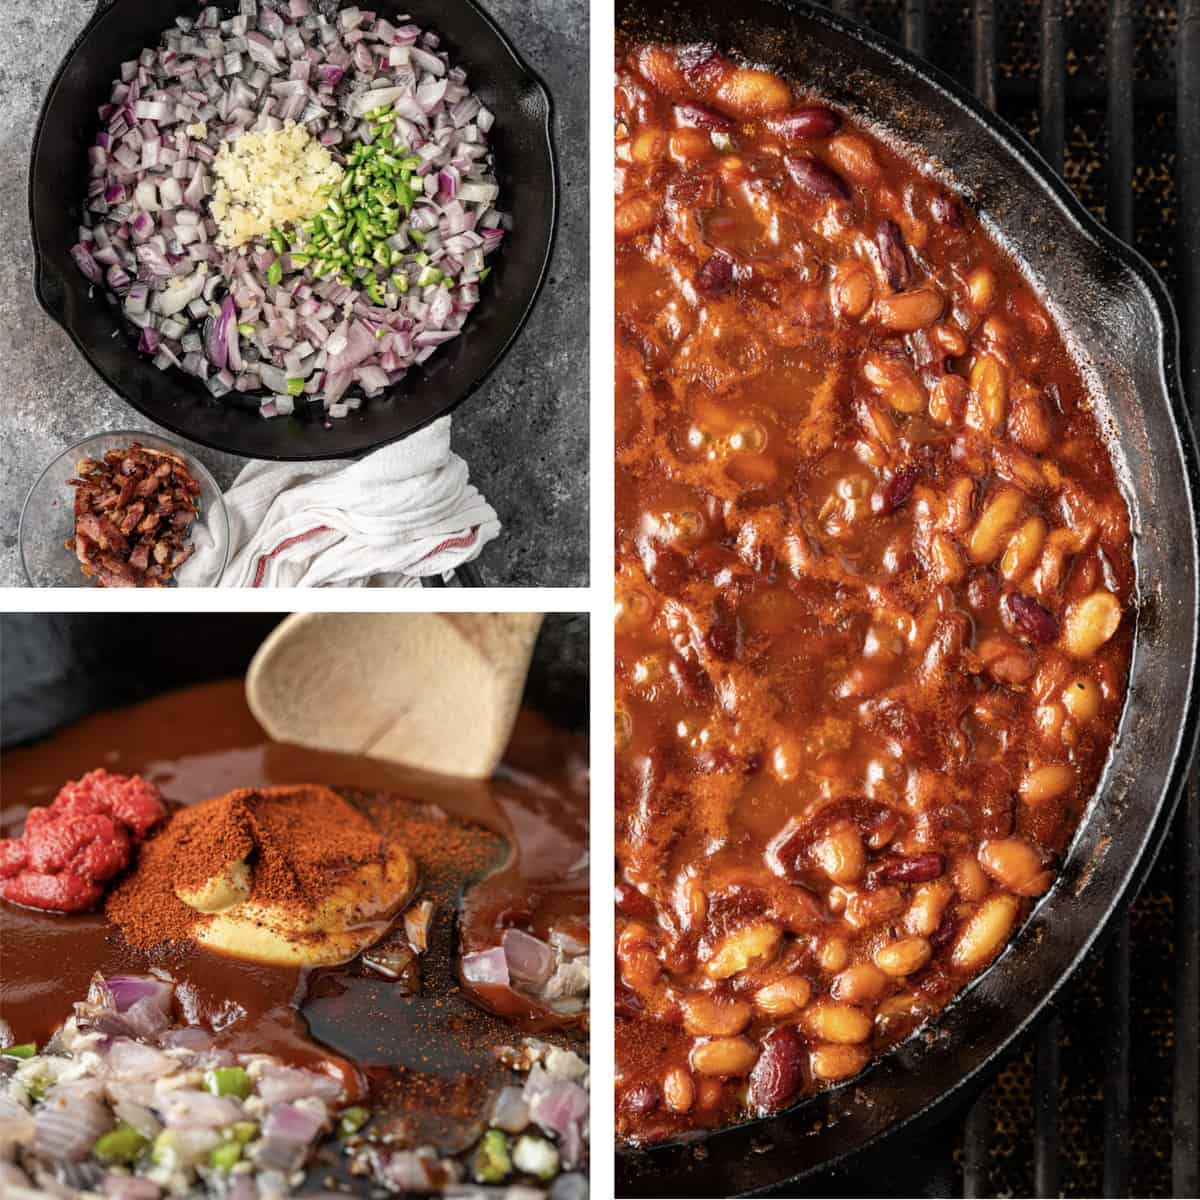 montage of prep photos to make smoked beans